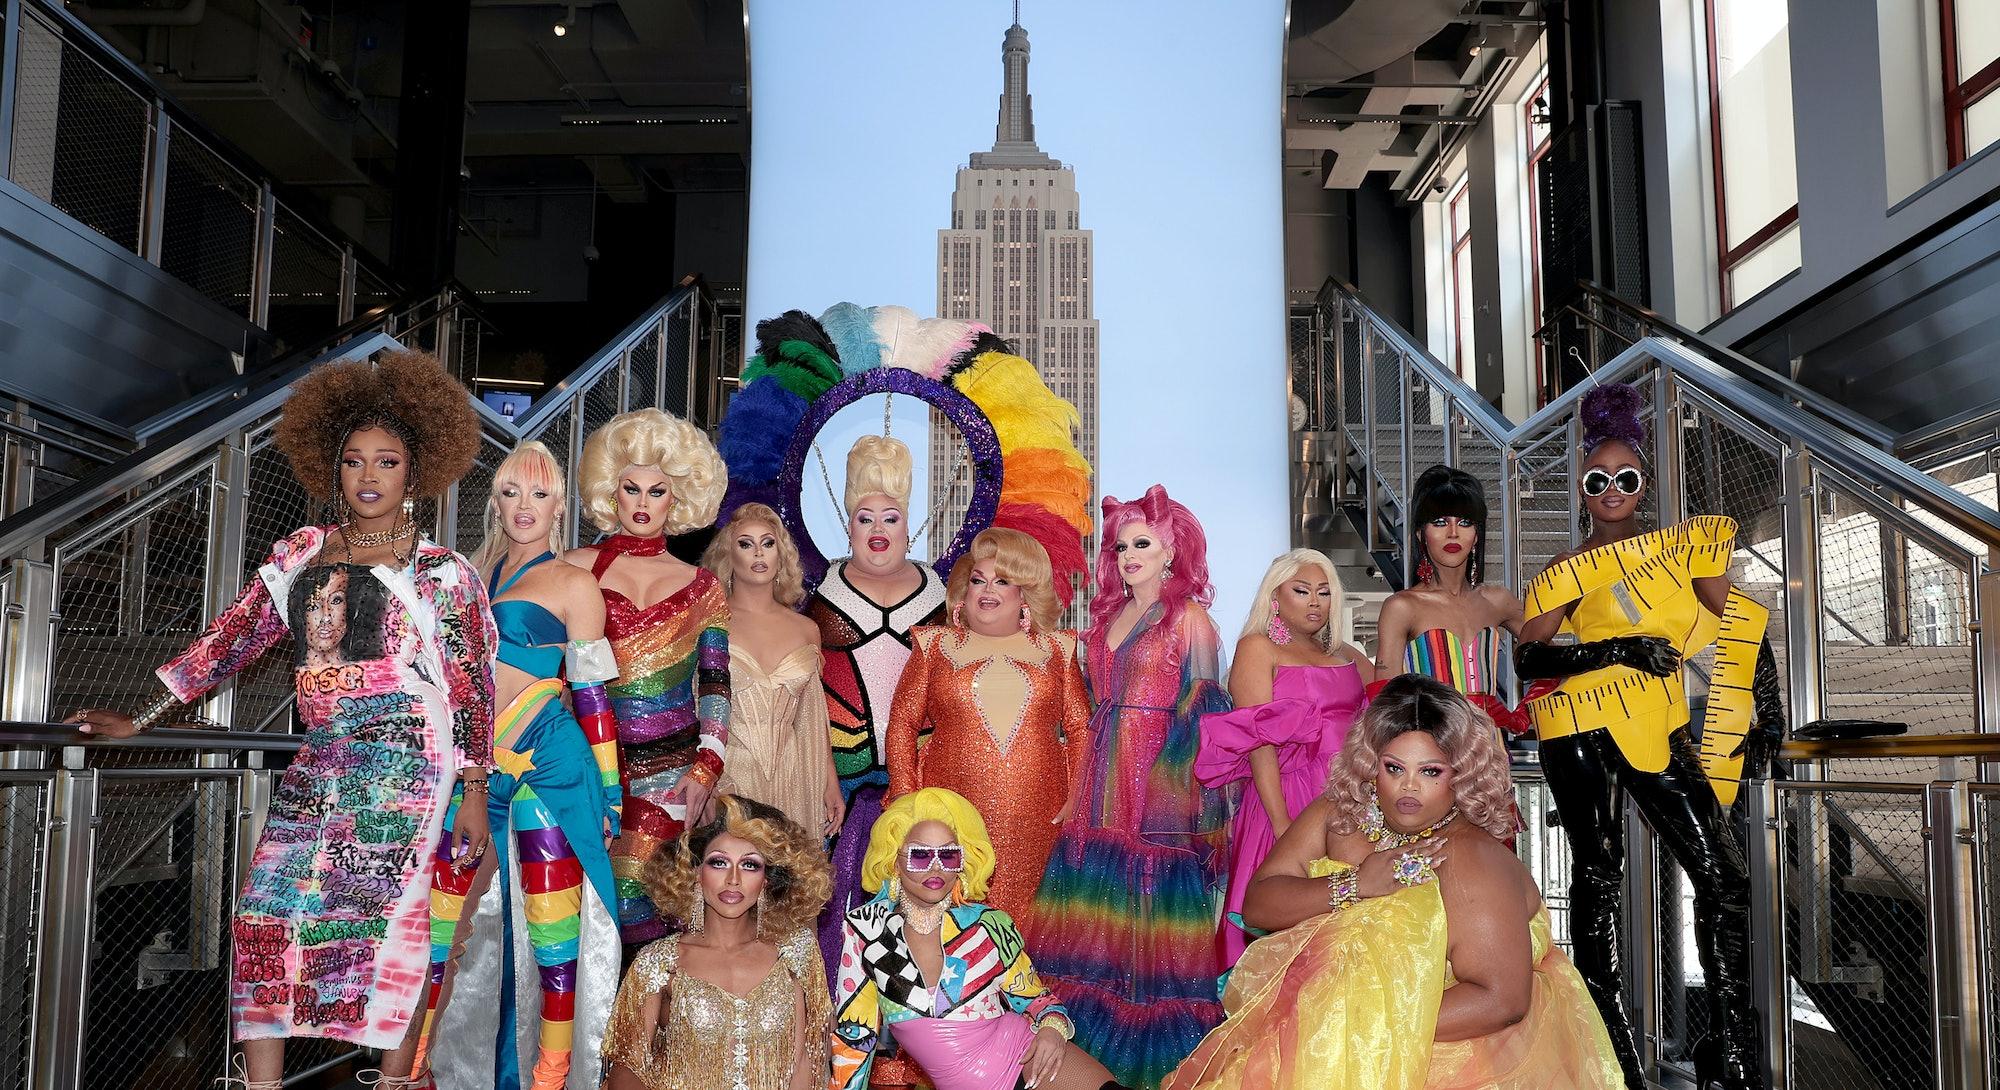 "A'keria C. Davenport, Kylie Sonique Love, Scarlet Envy, Jan, Eureka!, Ginger Minj, Pandora Boxx, Jiggly Caliente, Trinity K. Bonet, Ra'Jah O'Hara, (bottom row L-R) Serena ChaCha, Yara Sofia, and Silky Nutmeg Ganache attend as Empire State Building hosts the cast of ""RuPaul's Drag Race All Stars"" Season 6 on June 24, 2021 in New York City."